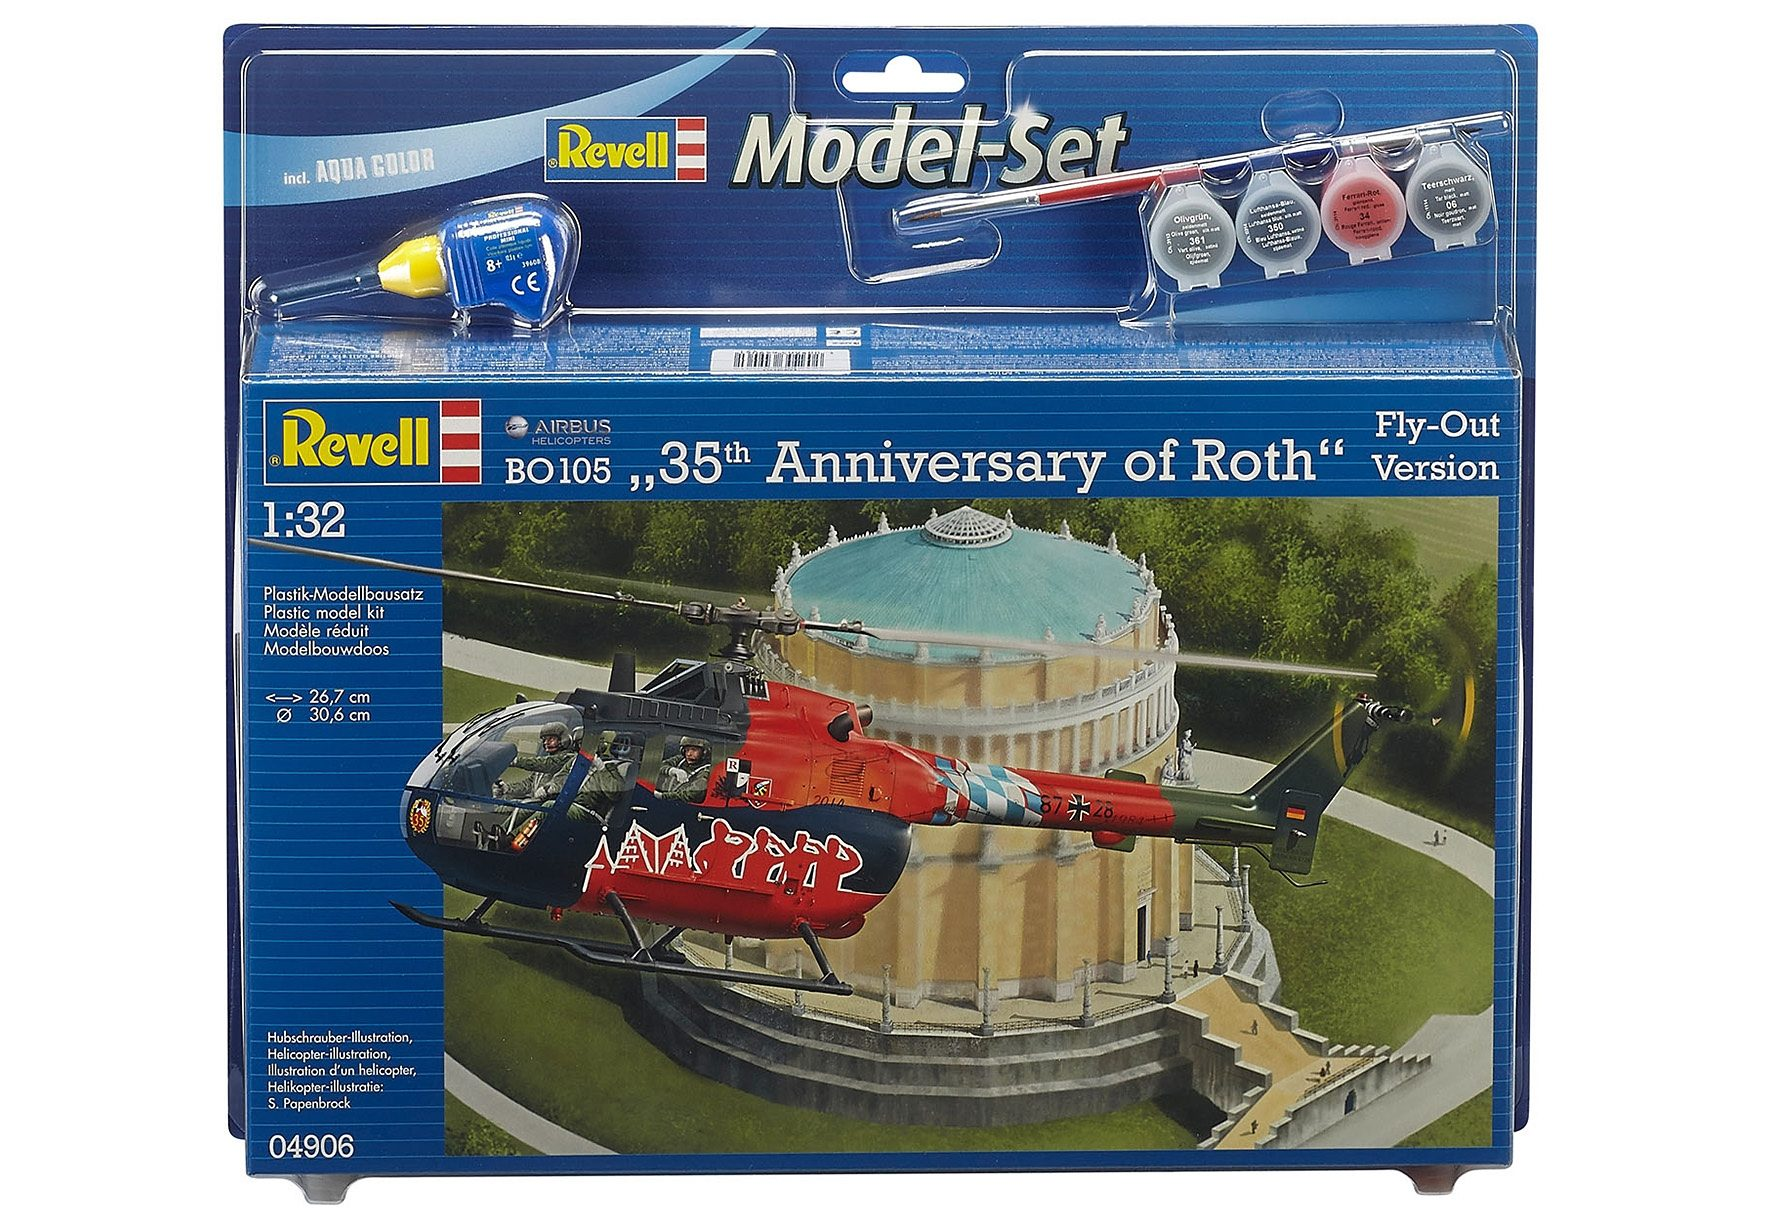 Revell® Modellbausatz Hubschrauber mit Zubehör, Maßstab 1:32, »BO 105 Fly Out Paintin«